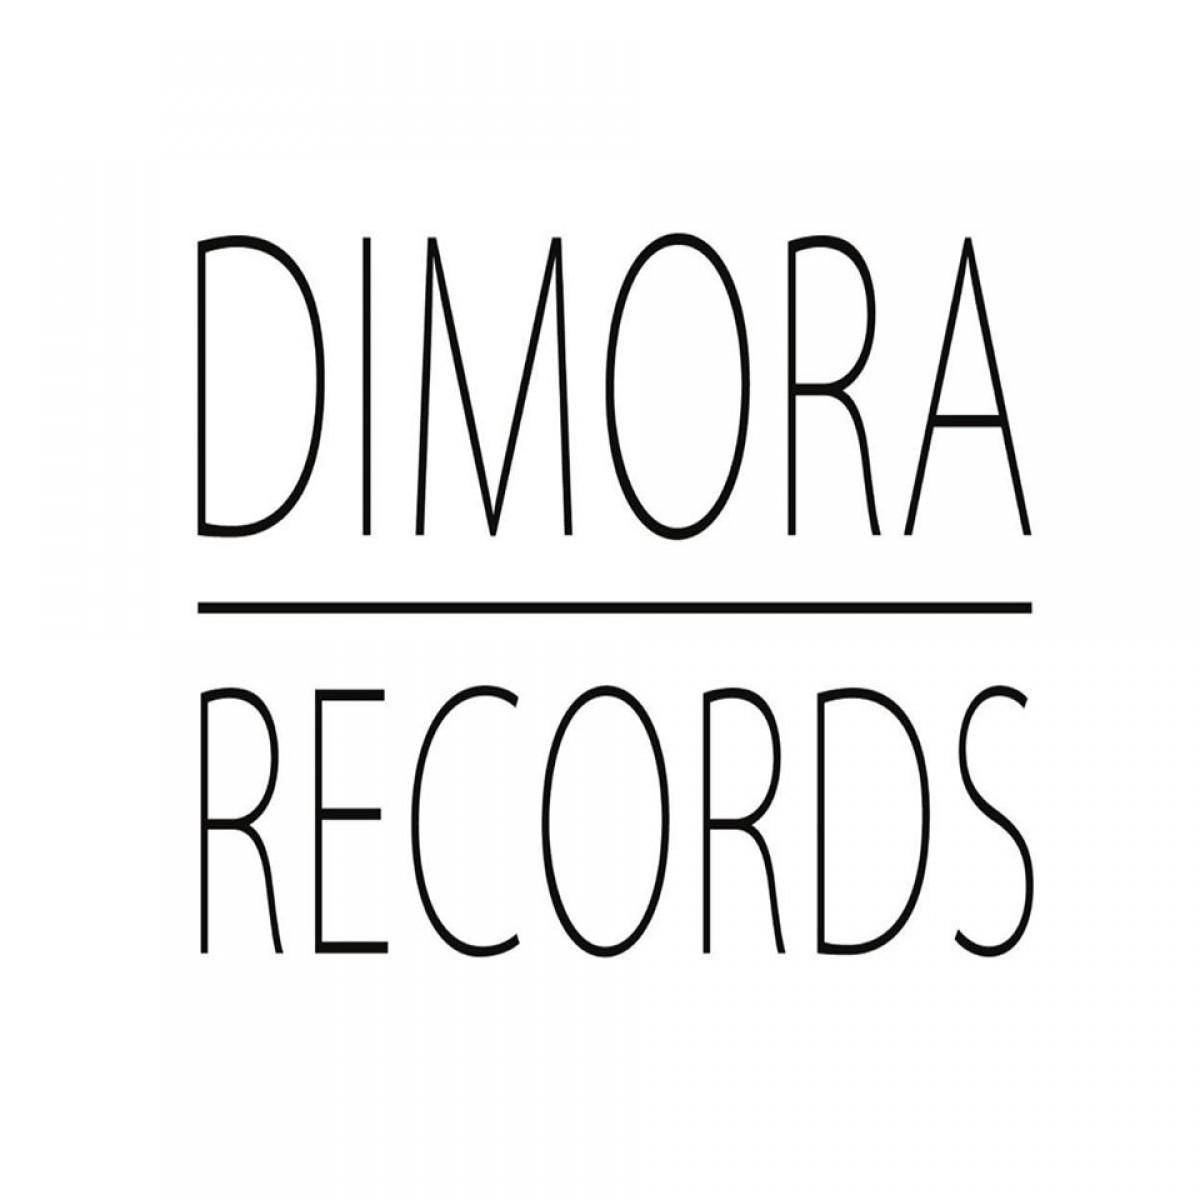 Dimora Records